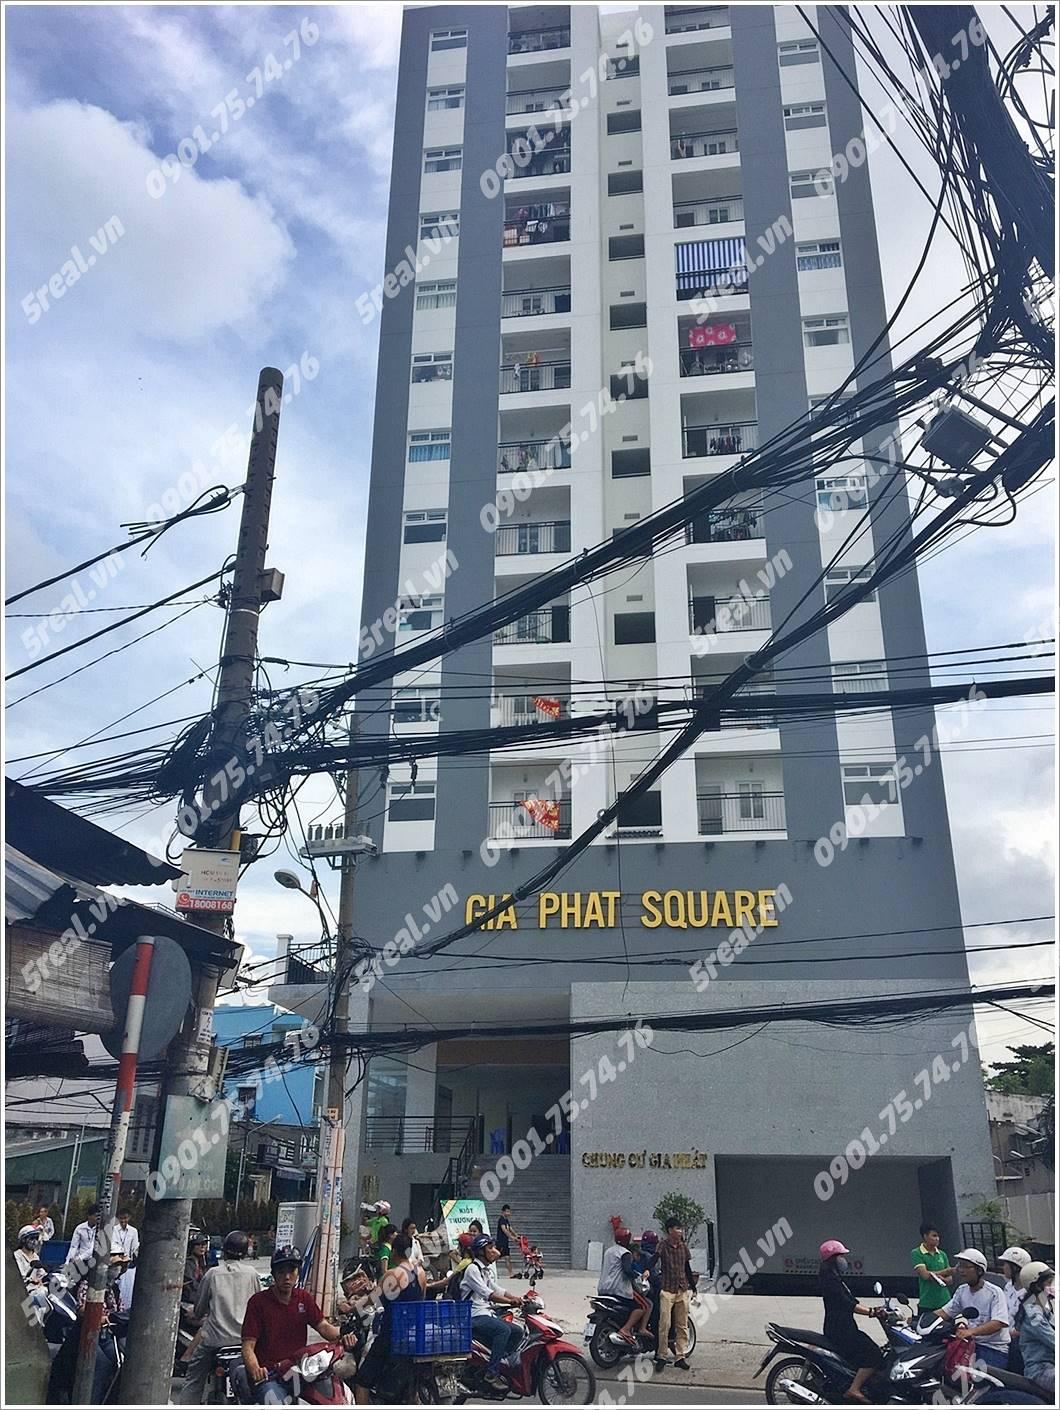 gia-phat-square-le-duc-tho-quan-go-vap-van-phong-cho-thue-tphcm-5real.vn-01